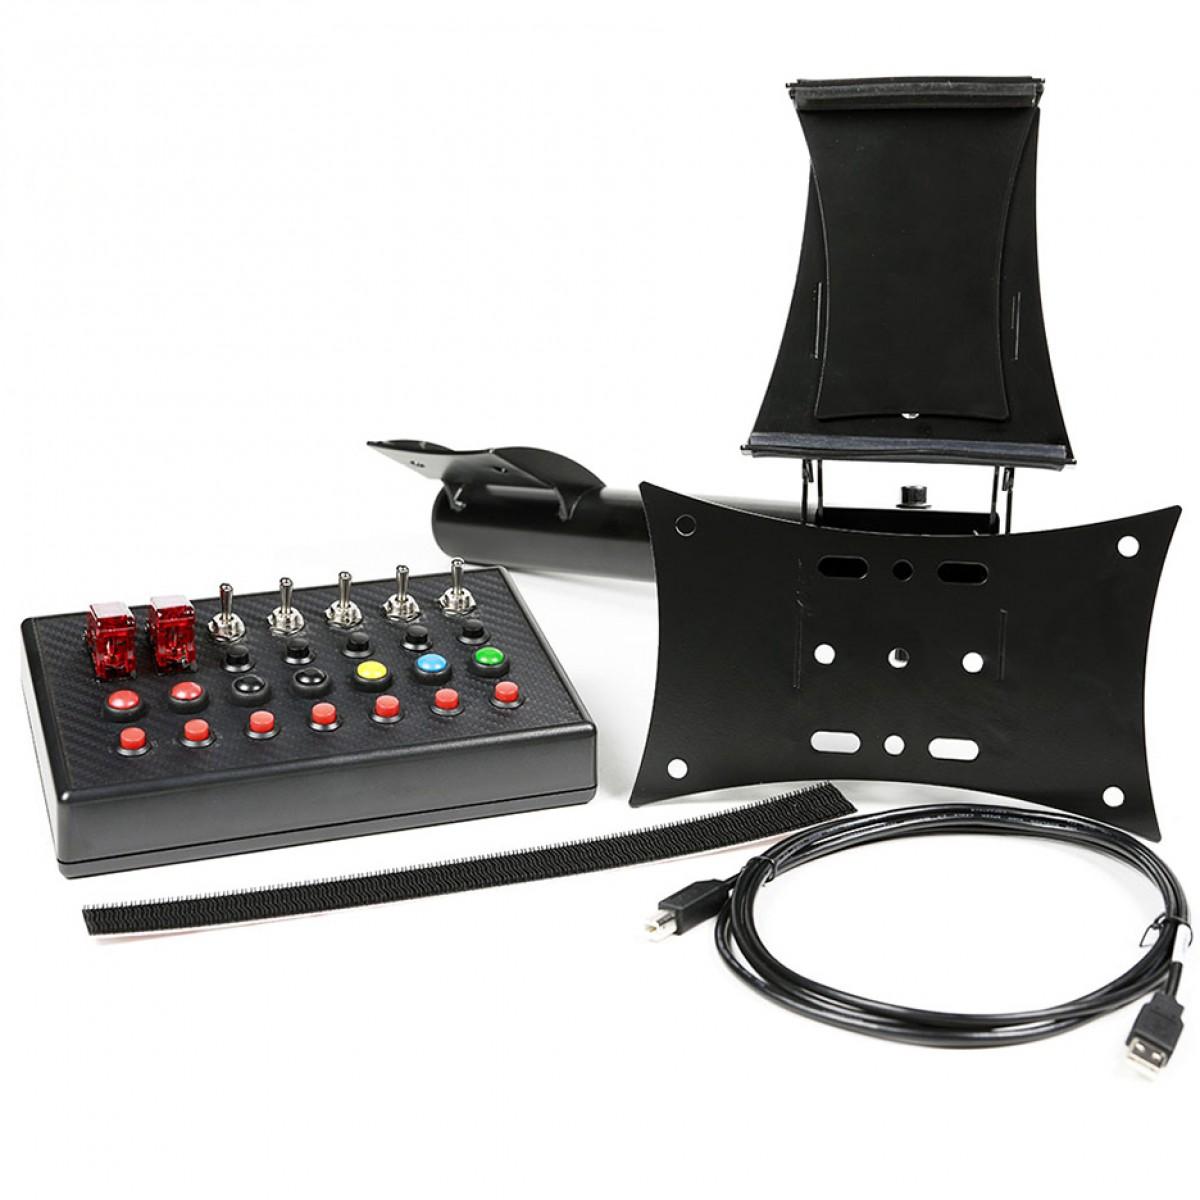 Bundle RS1 Buttonbox Upgrade Kit + DSD Track Boss Buttonbox + USB + 3M